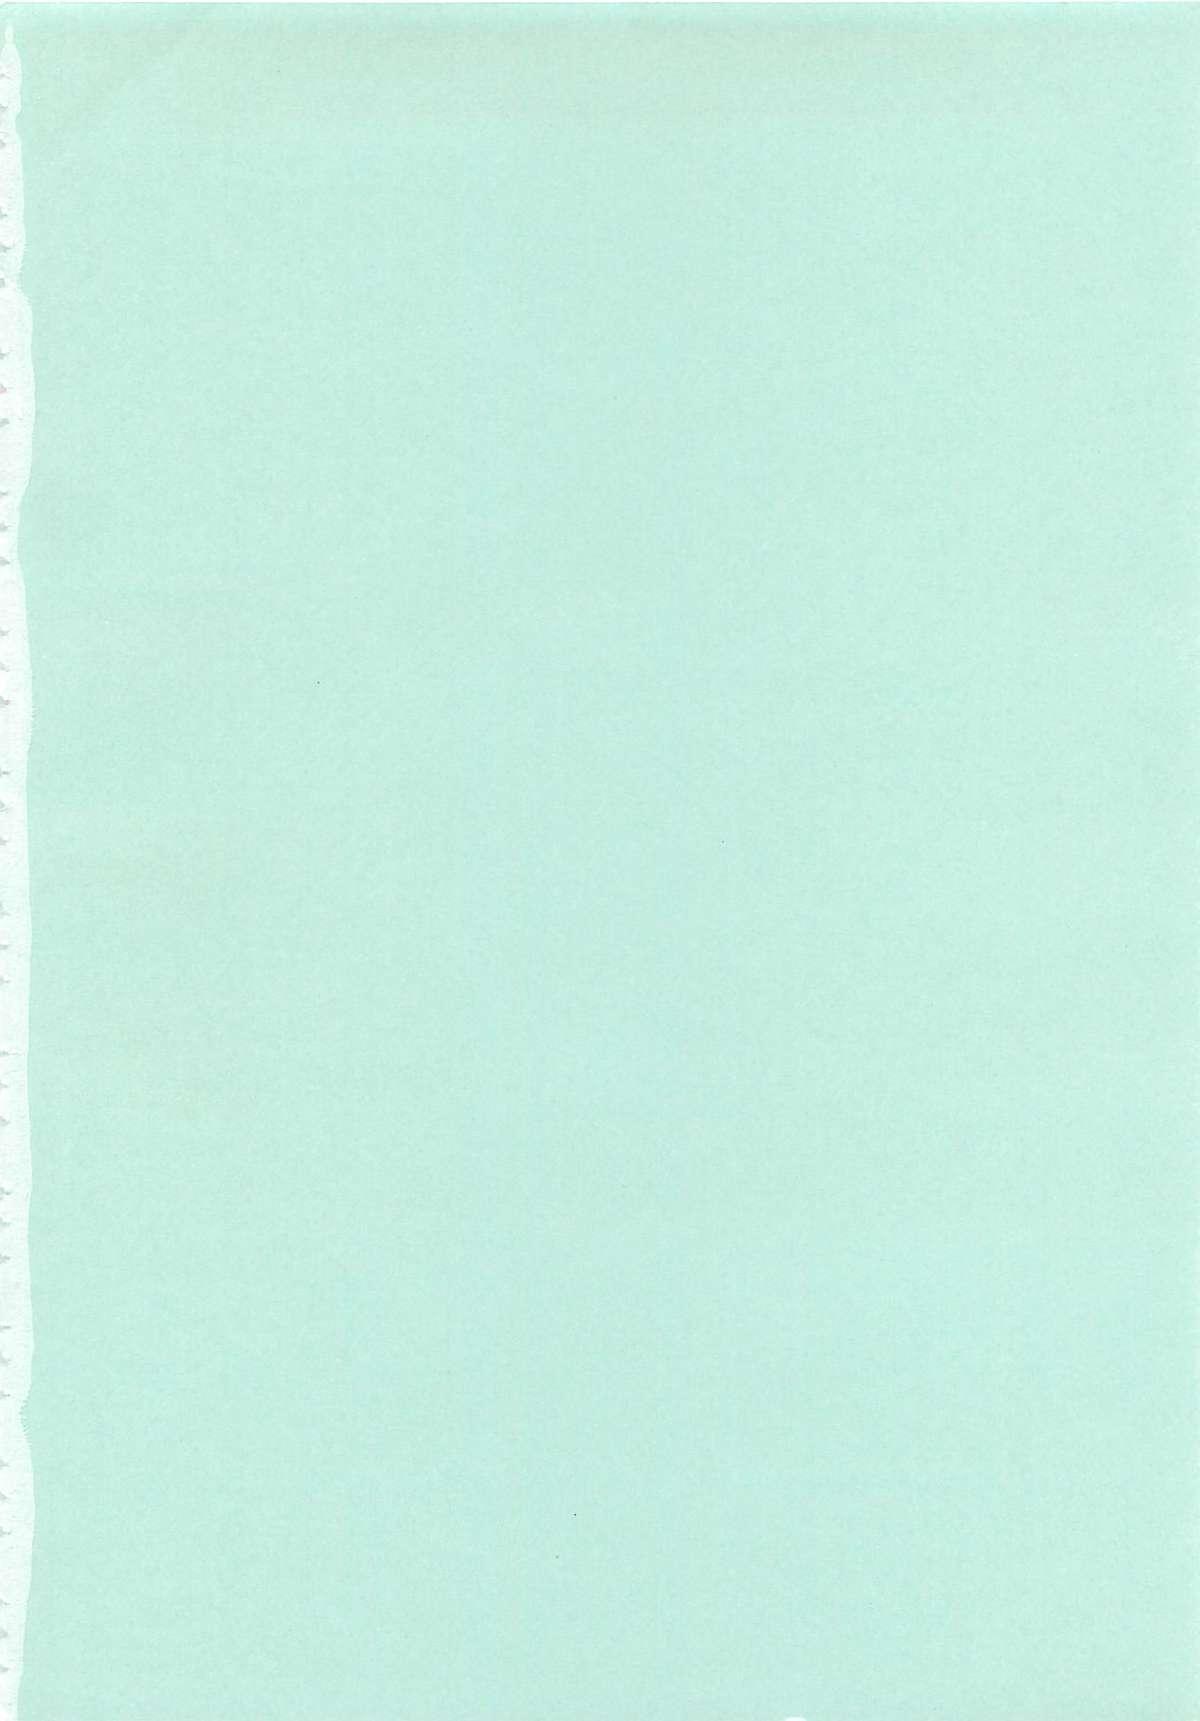 Otokonoko HEAVEN Vol. 02 Dokidoki Chikan Taiken 4